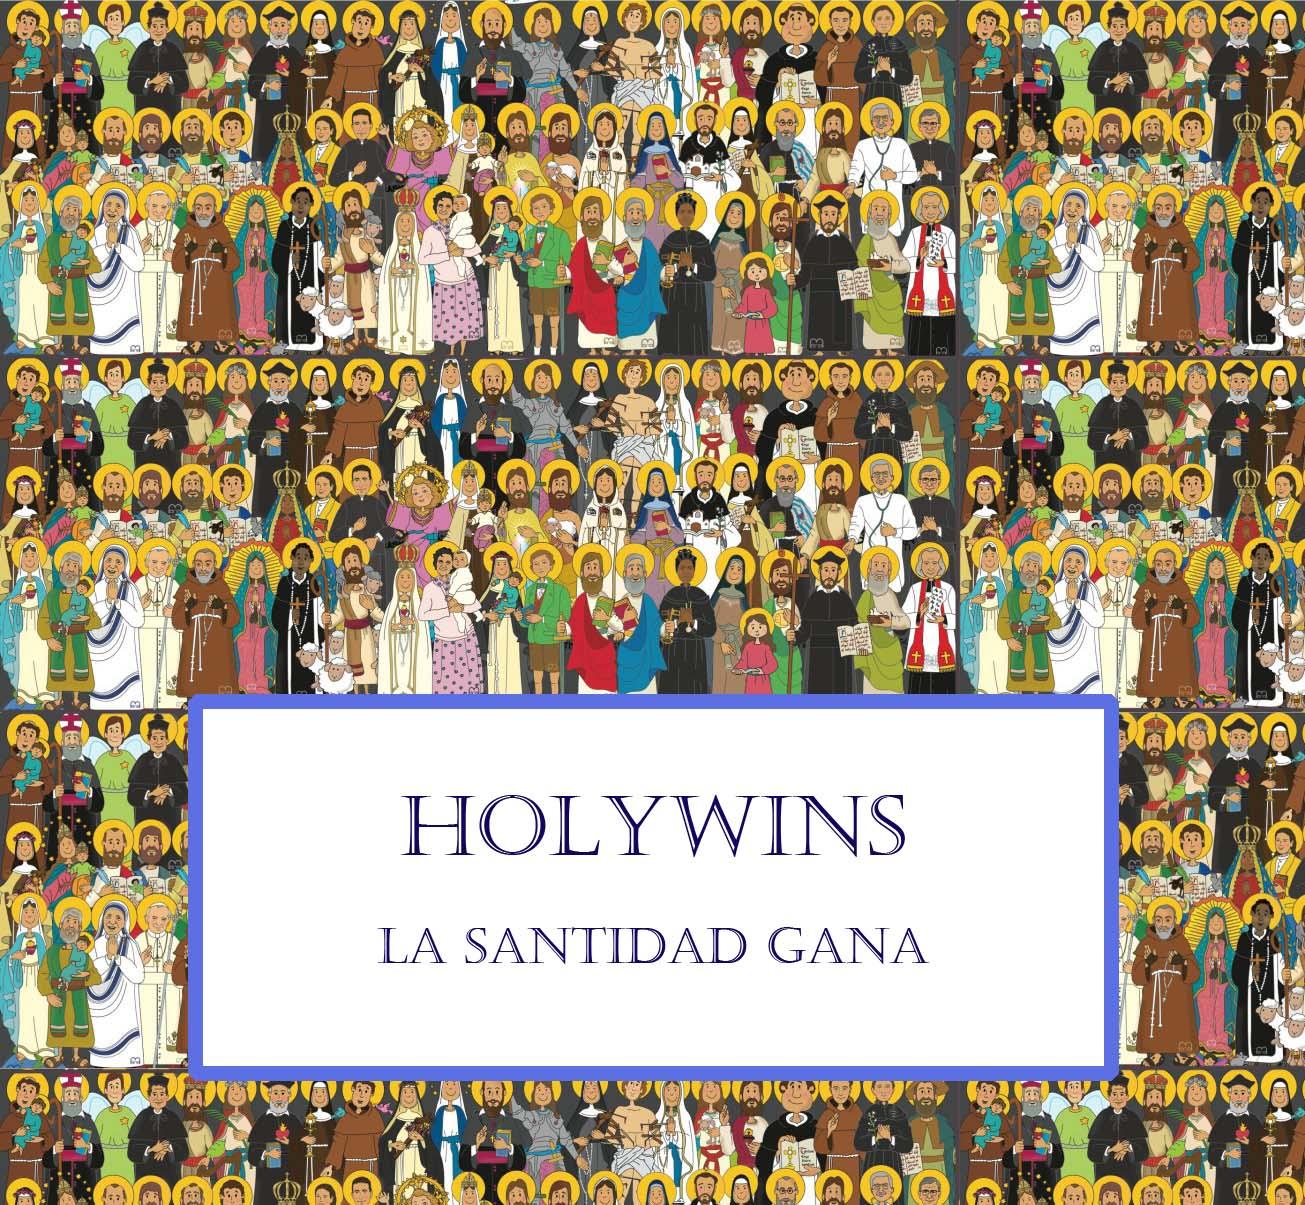 Resultado de imagen de holywins 2016